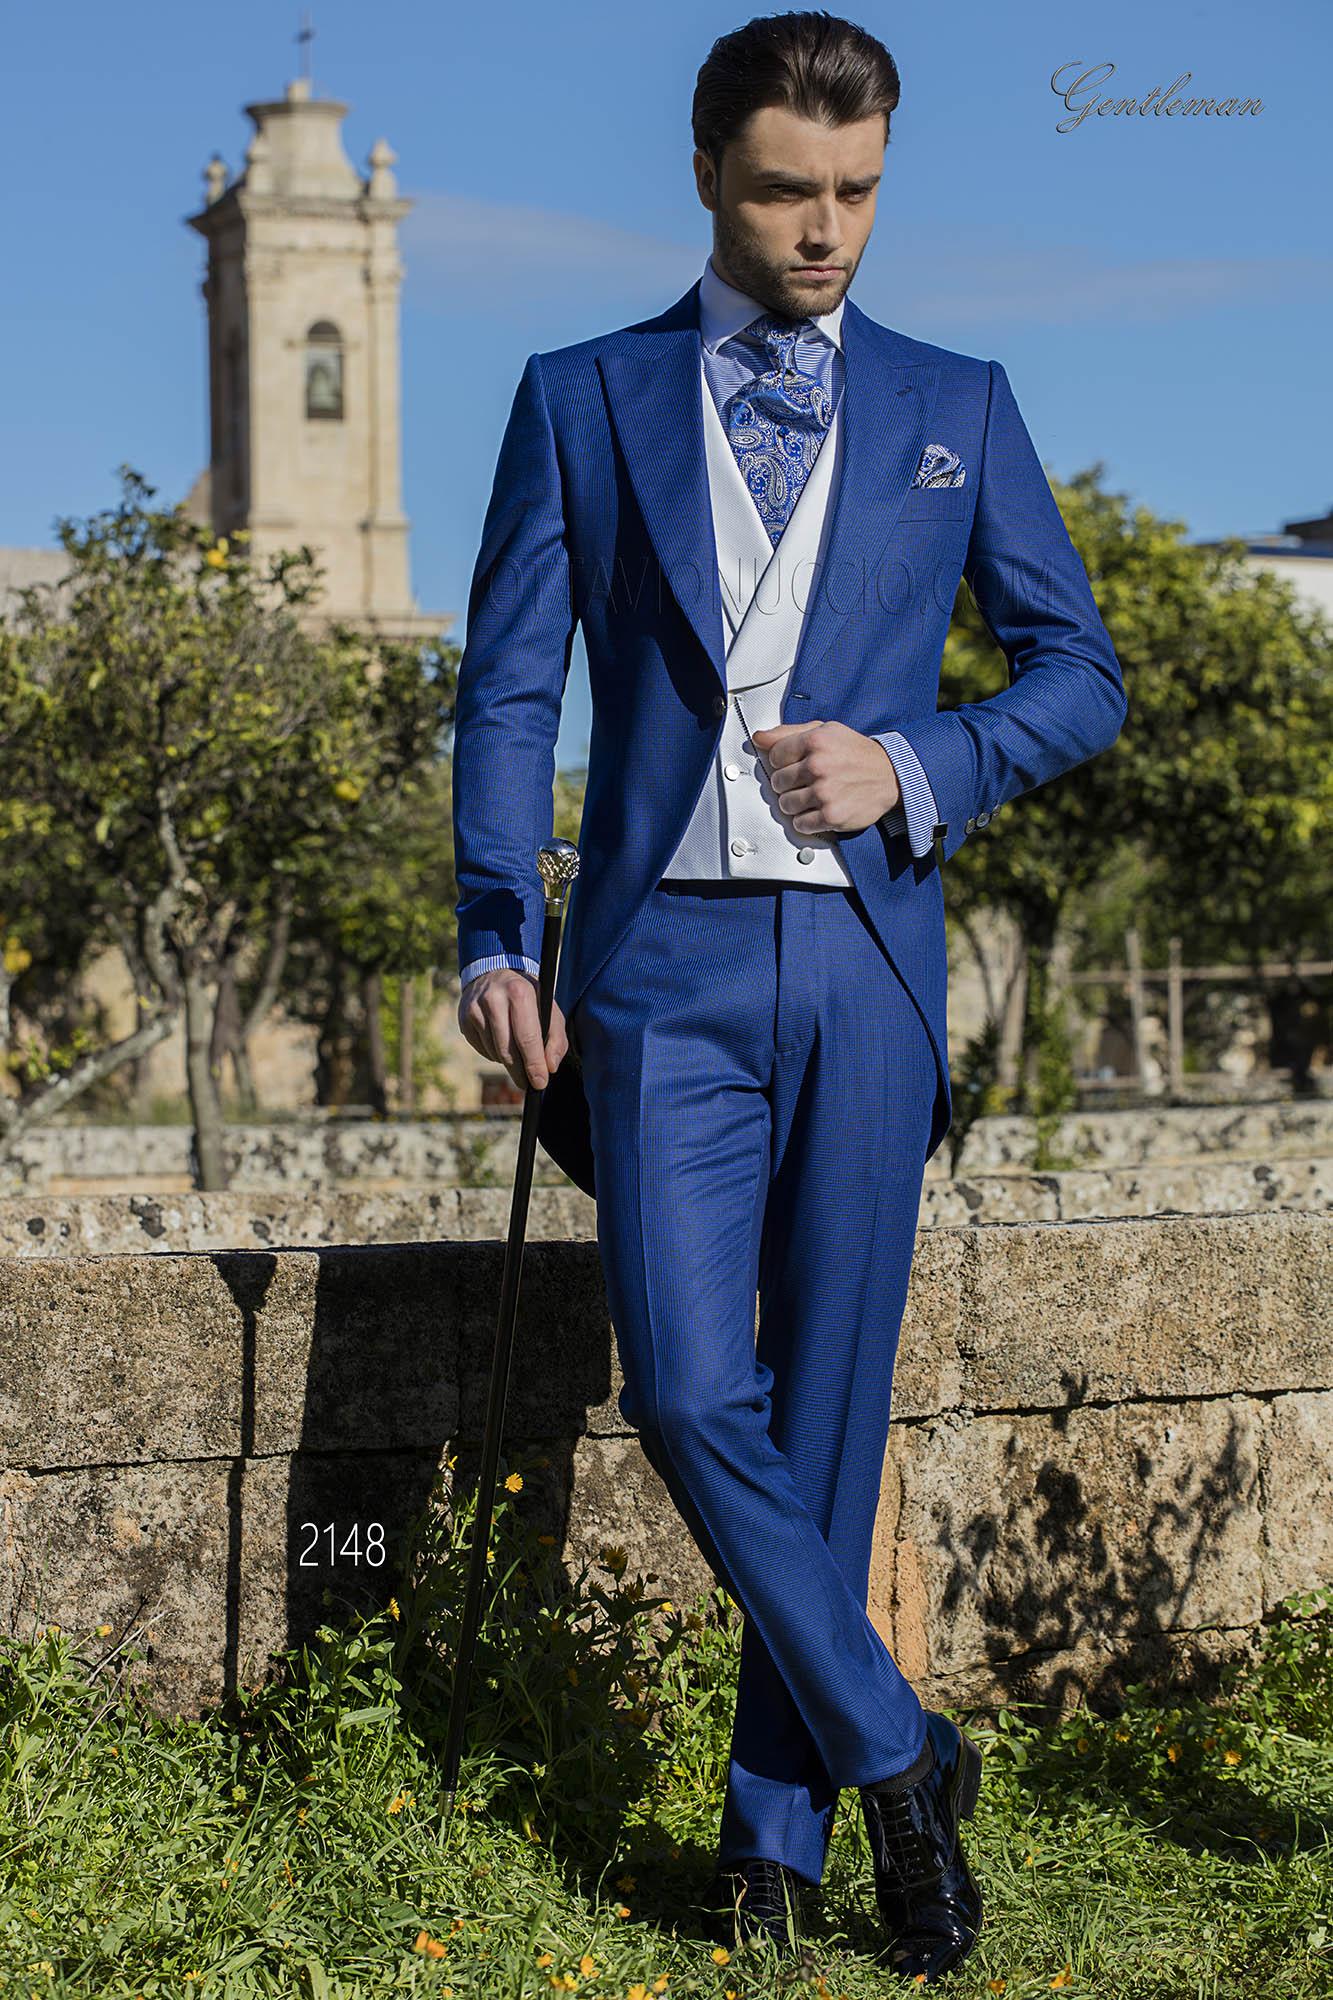 Outfit Testimone Matrimonio Uomo : Abito da cerimonia uomo pied de poule blu tight moderno